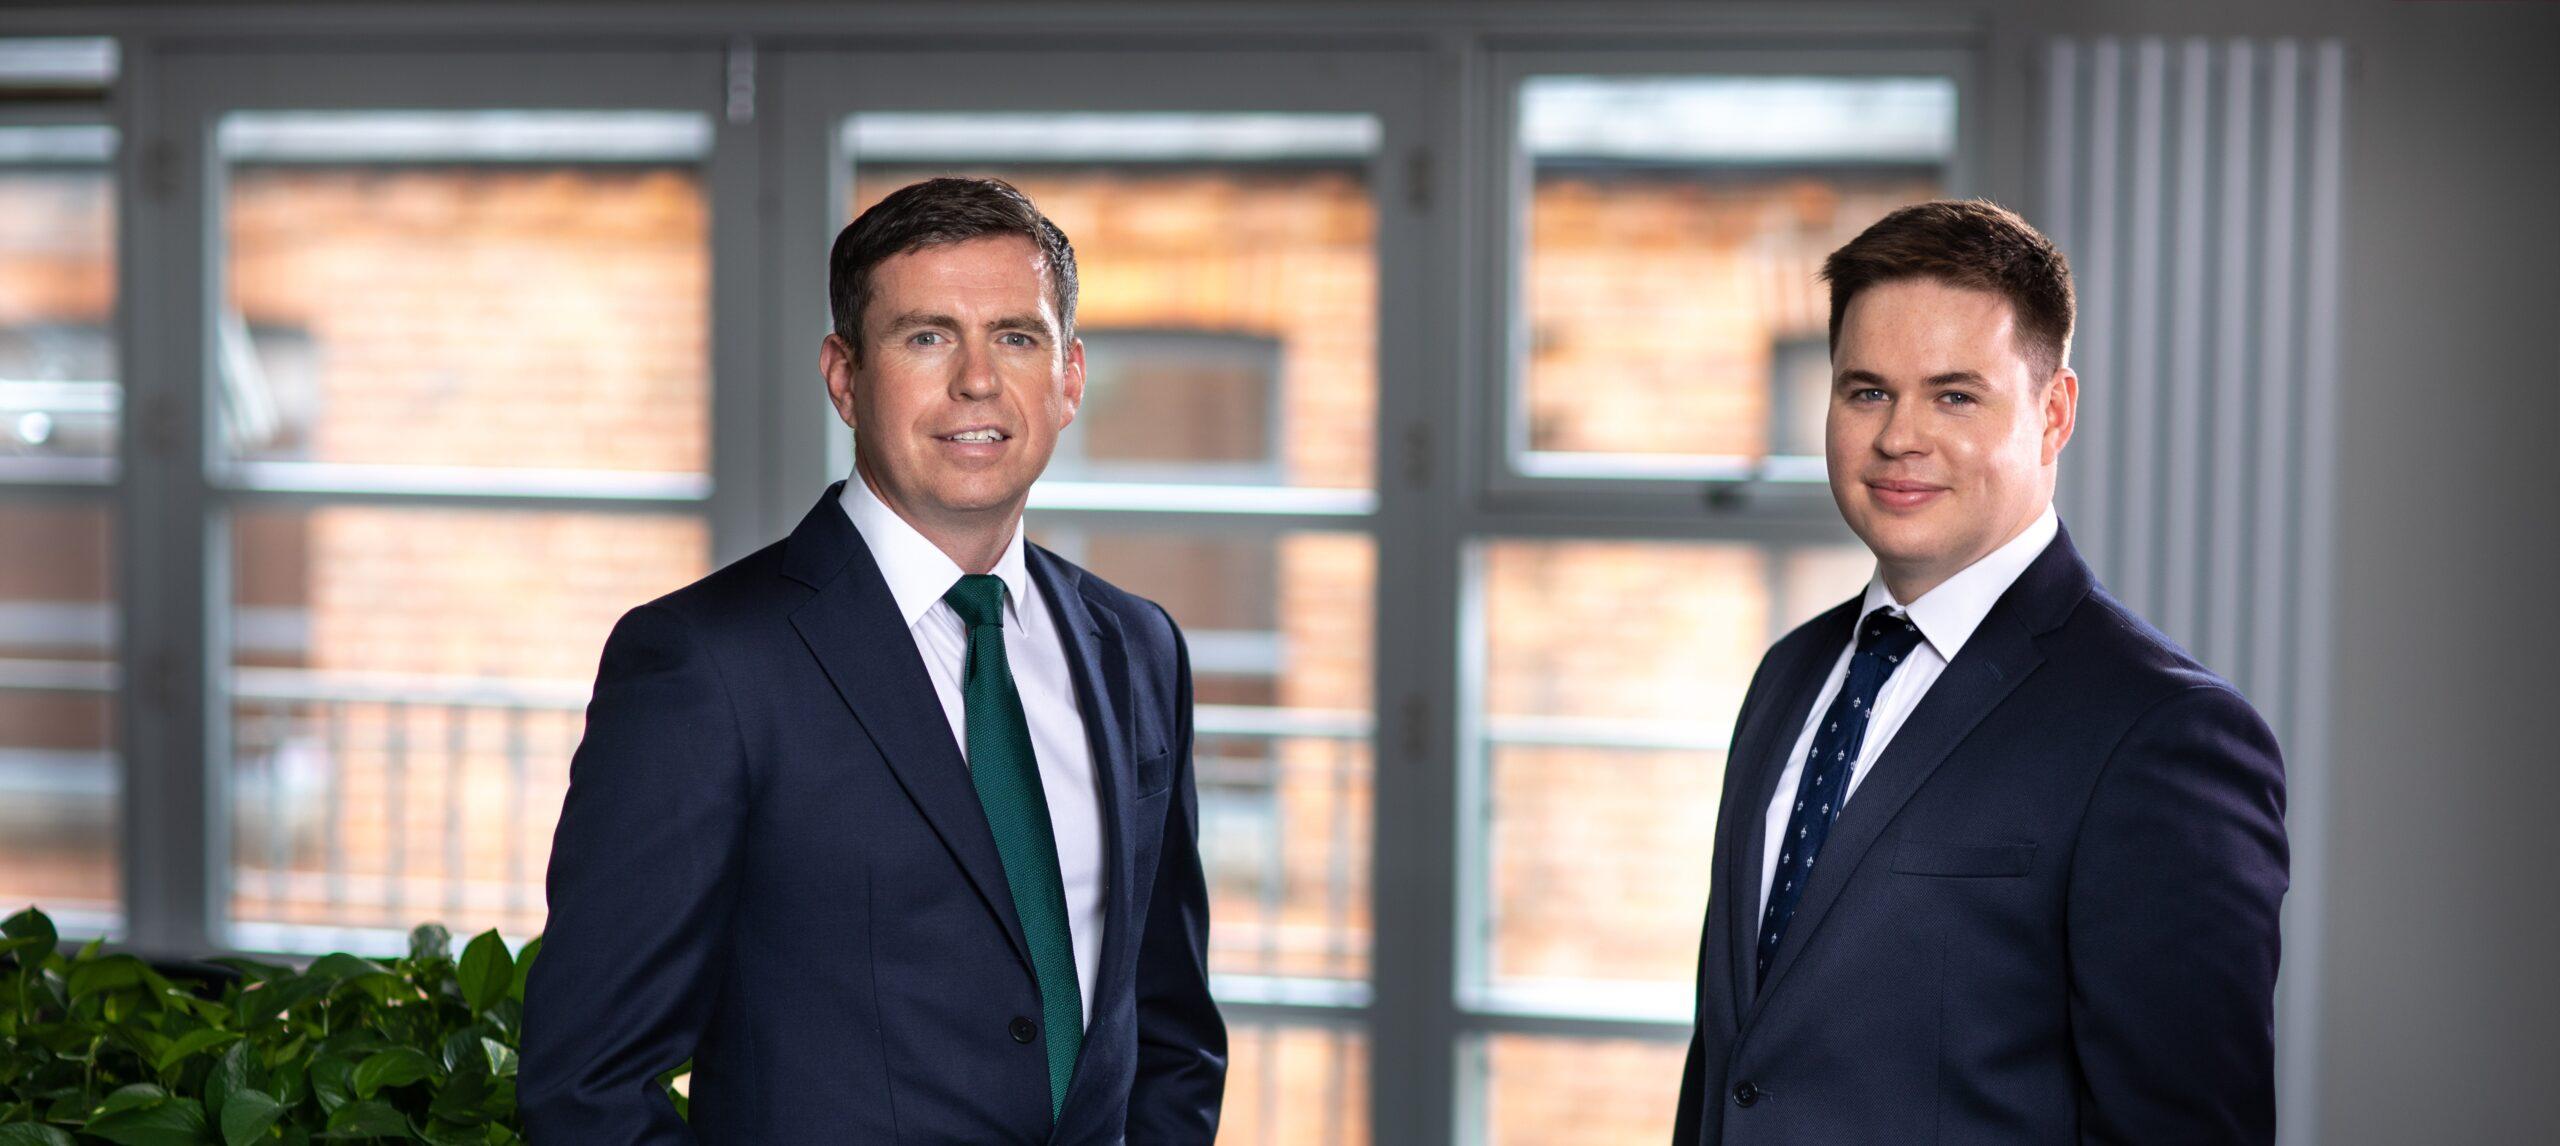 Donall Caherty and Matthew O'Brien